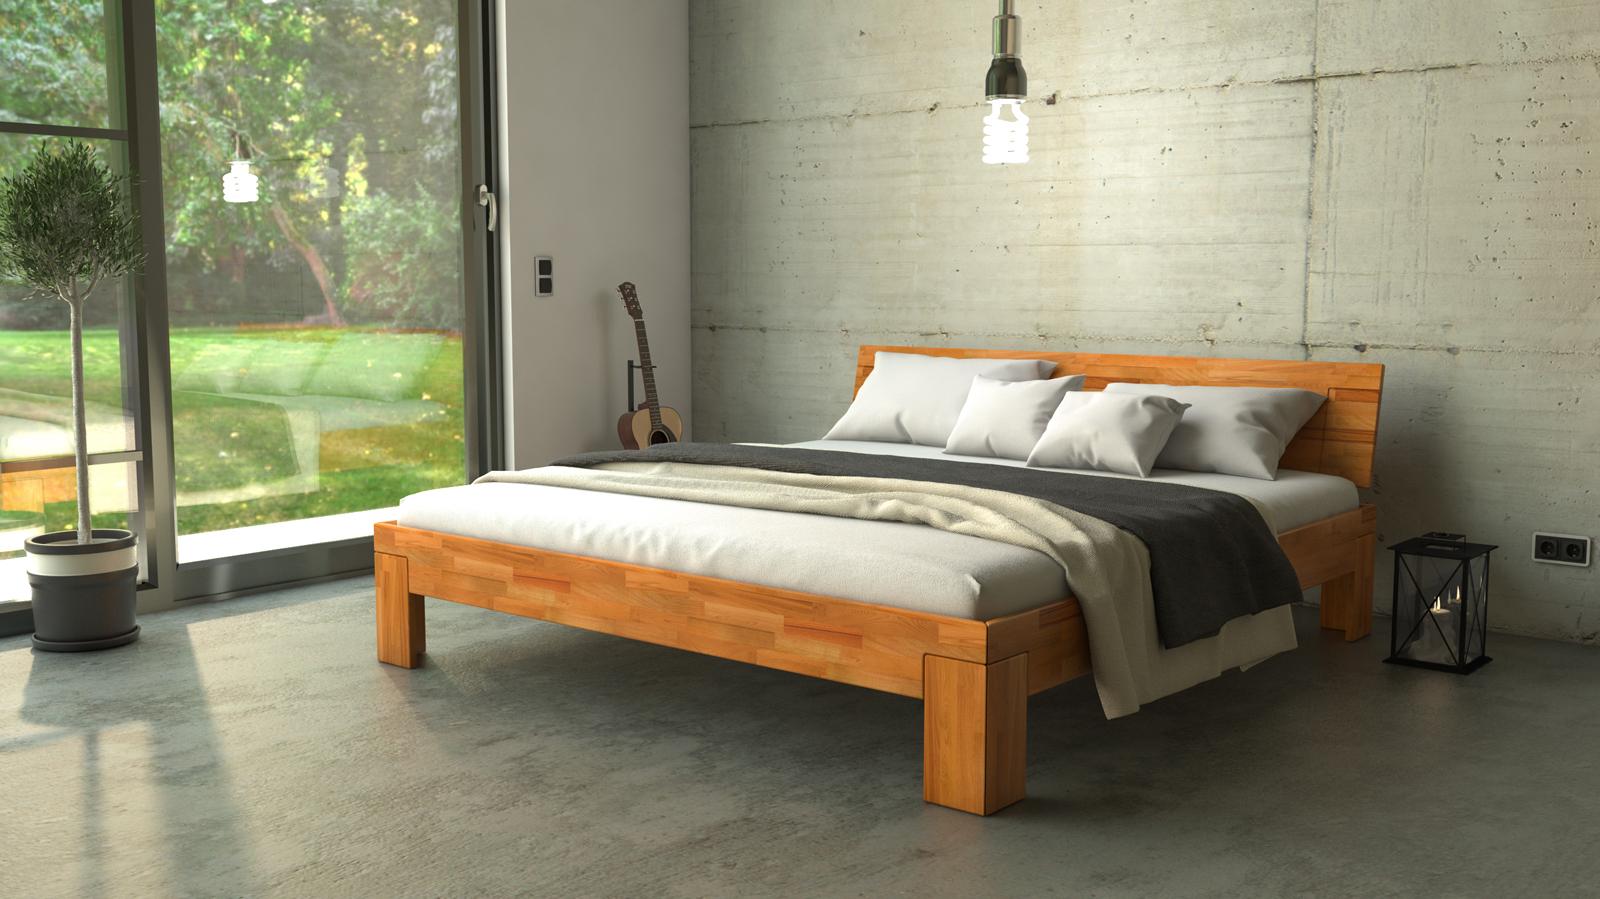 SAM® Massivholzbett Doppelbett in Buche geölt 200 x 200 cm SARA